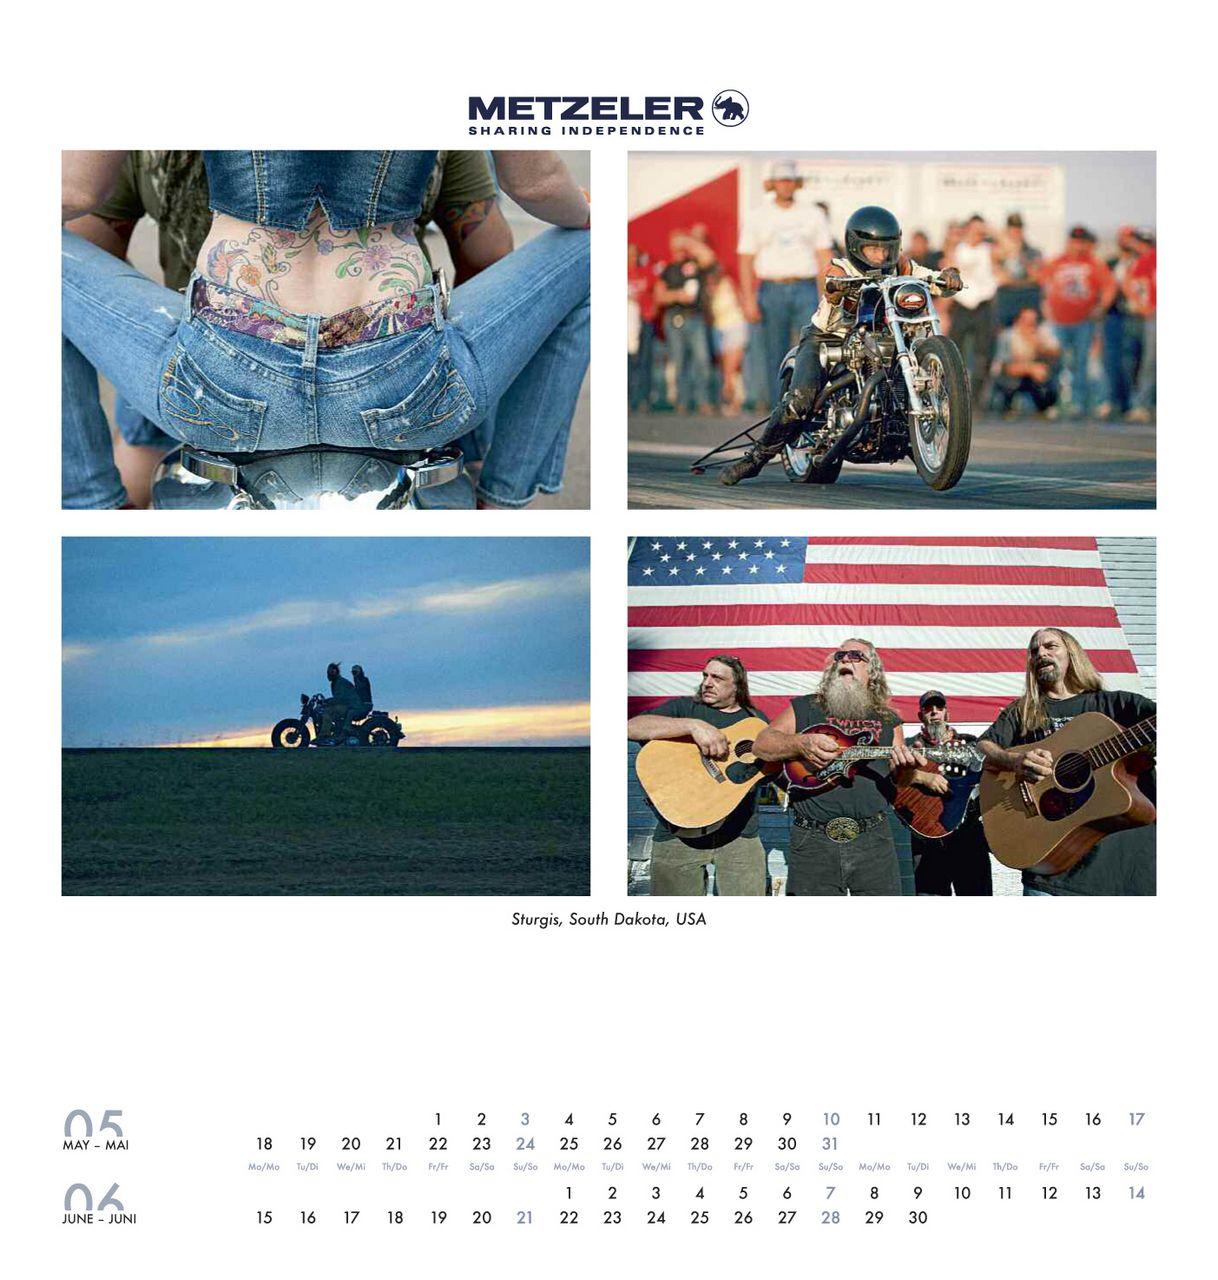 Yamaha Tricity 125 For Police - image 000036-000010155 on https://moto.motori.net